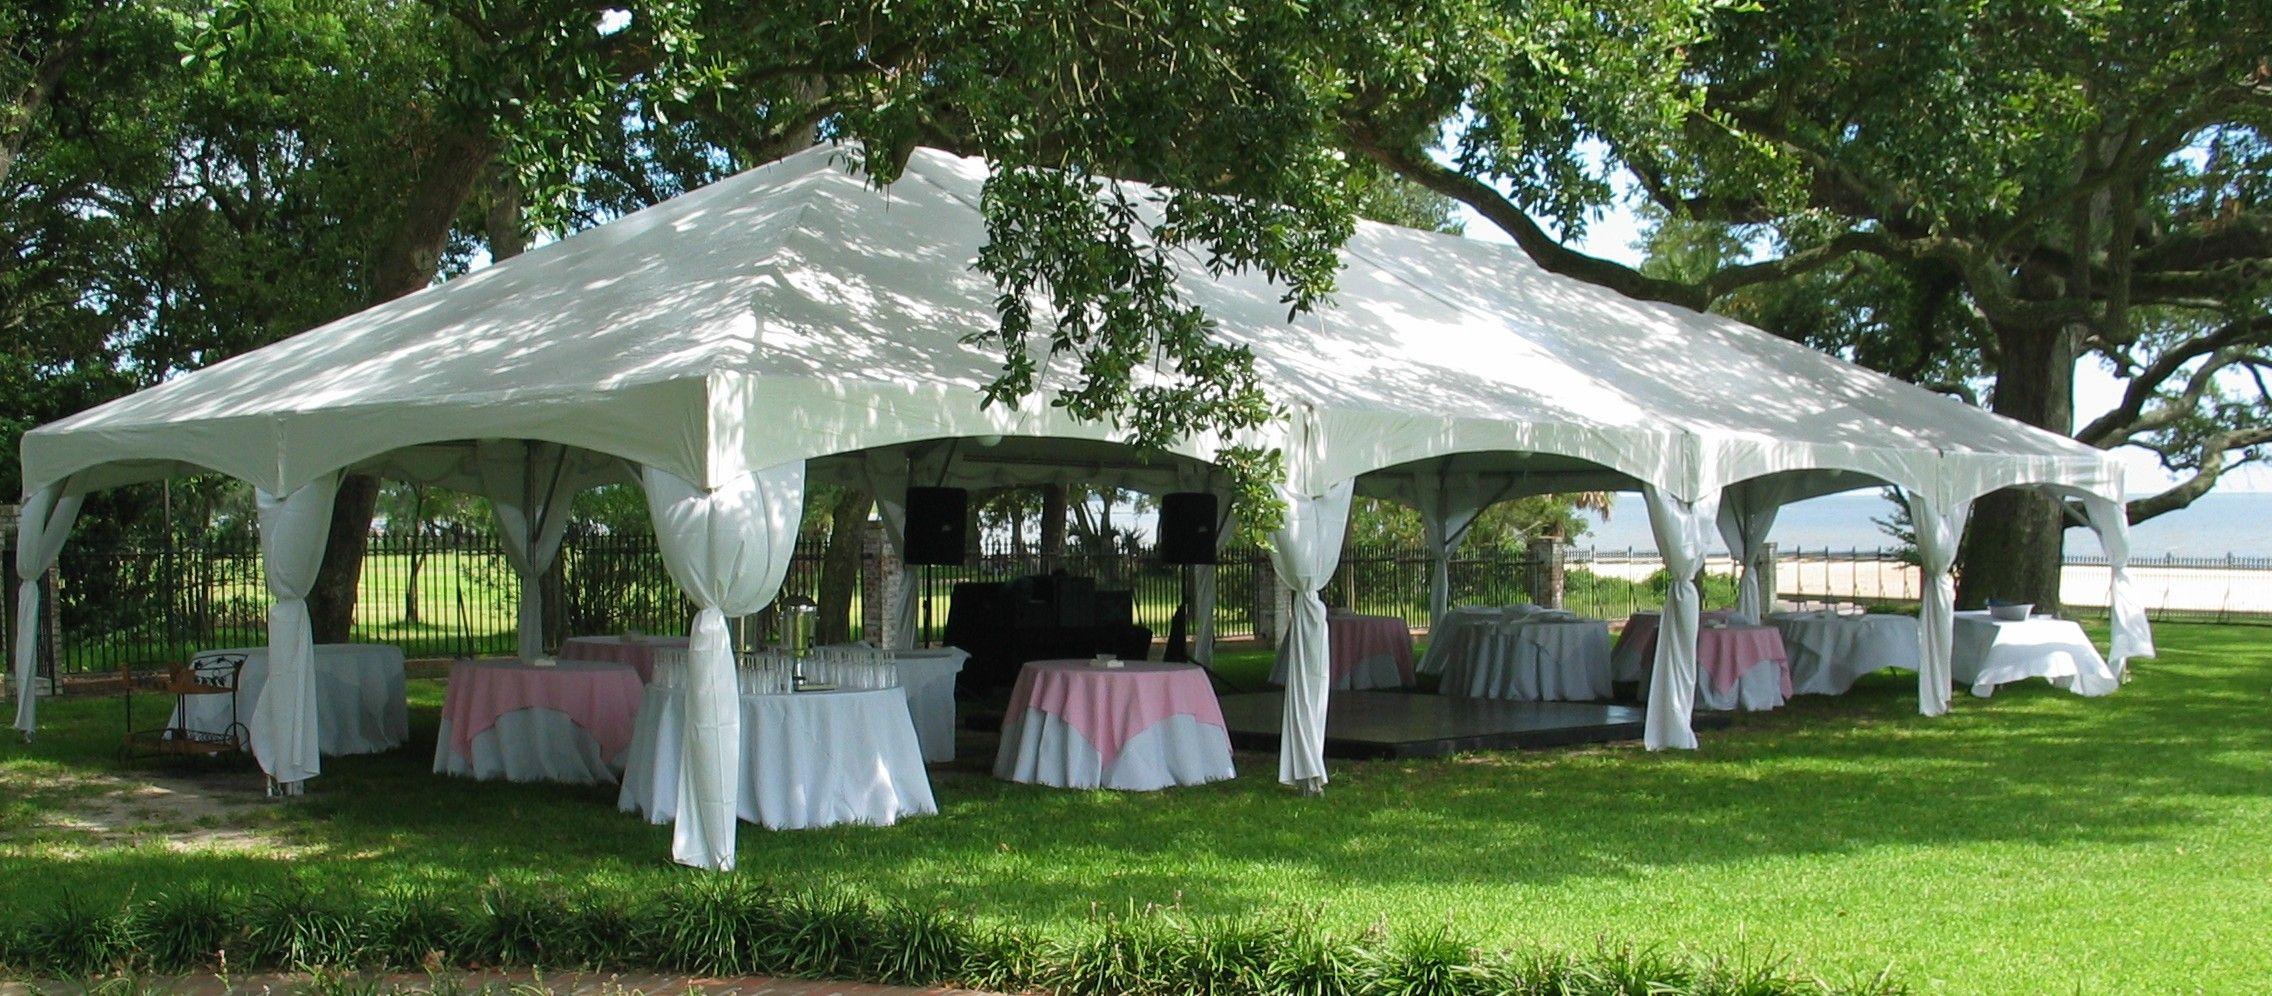 30x60 Tent (Frame) & 30x60 Tent (Frame) | Mrs. Latta! | Pinterest | Tents and Wedding